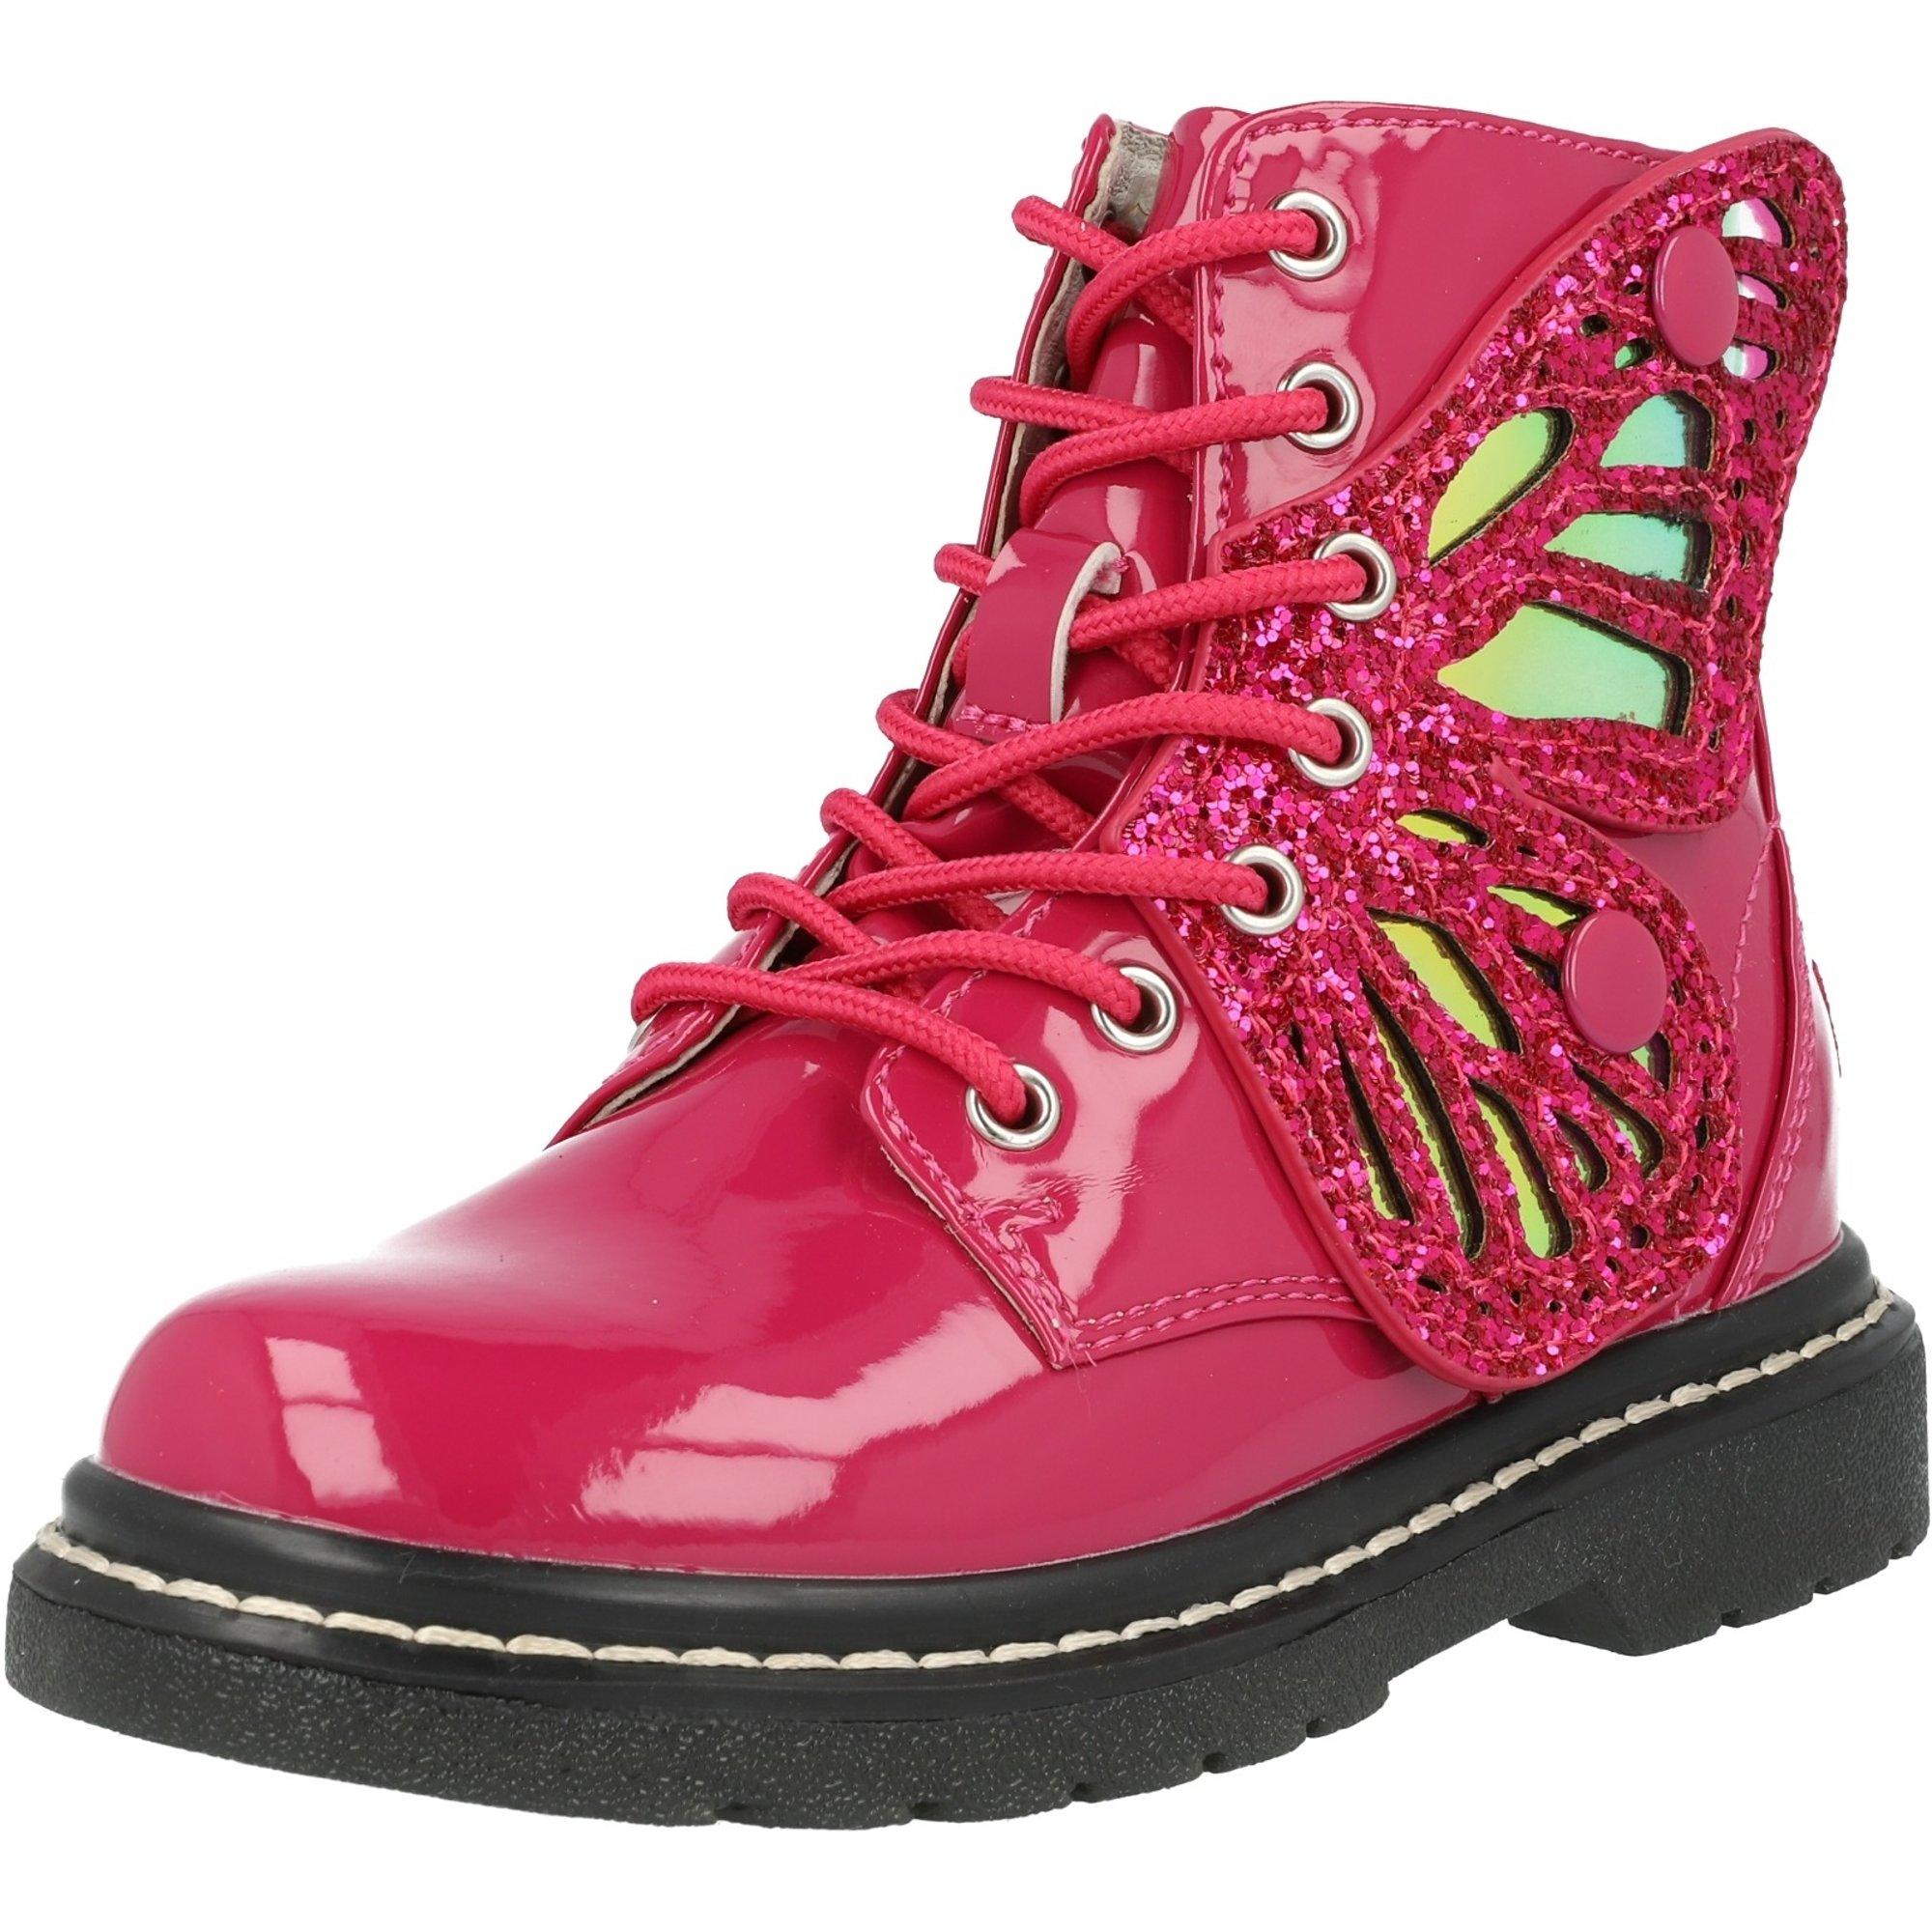 Lelli Kelly Fairy Wings Mid Pink Patent